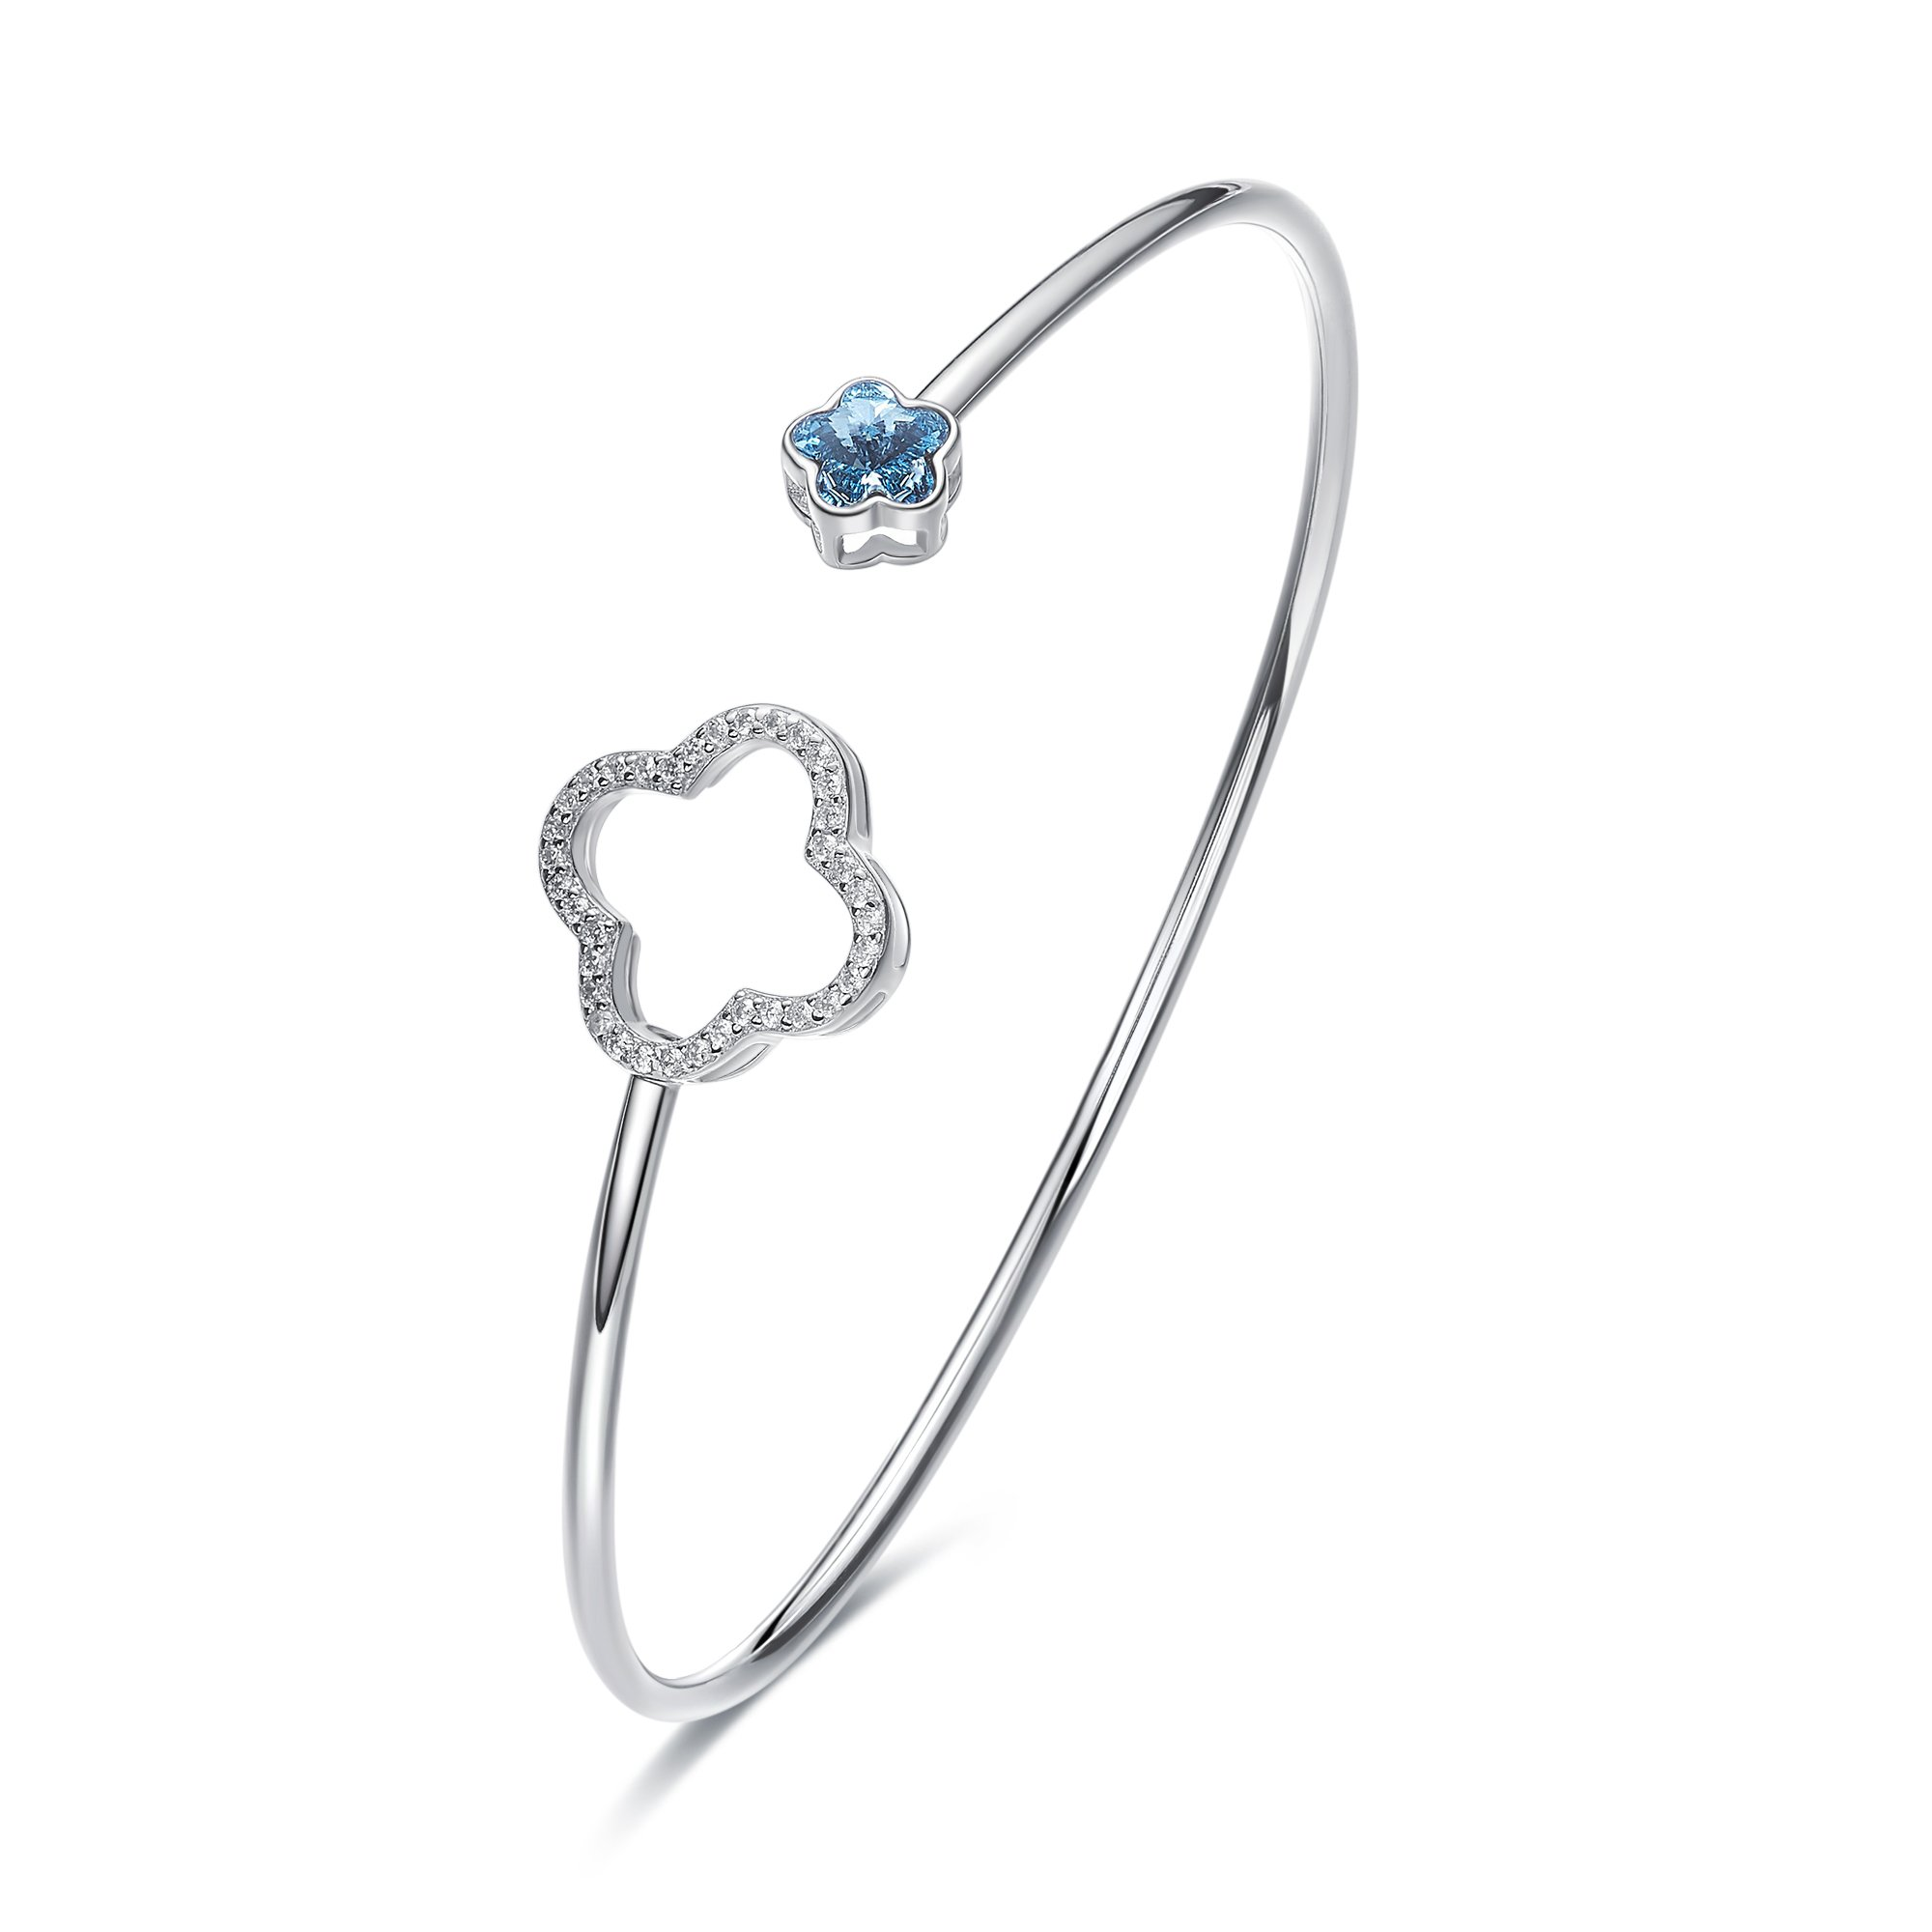 CDE Bracelets for Women Sterling Silver Swarovski Crystal Open Cuff Bangle Bracelet Smooth Hollow Hoop Gifts for Girls